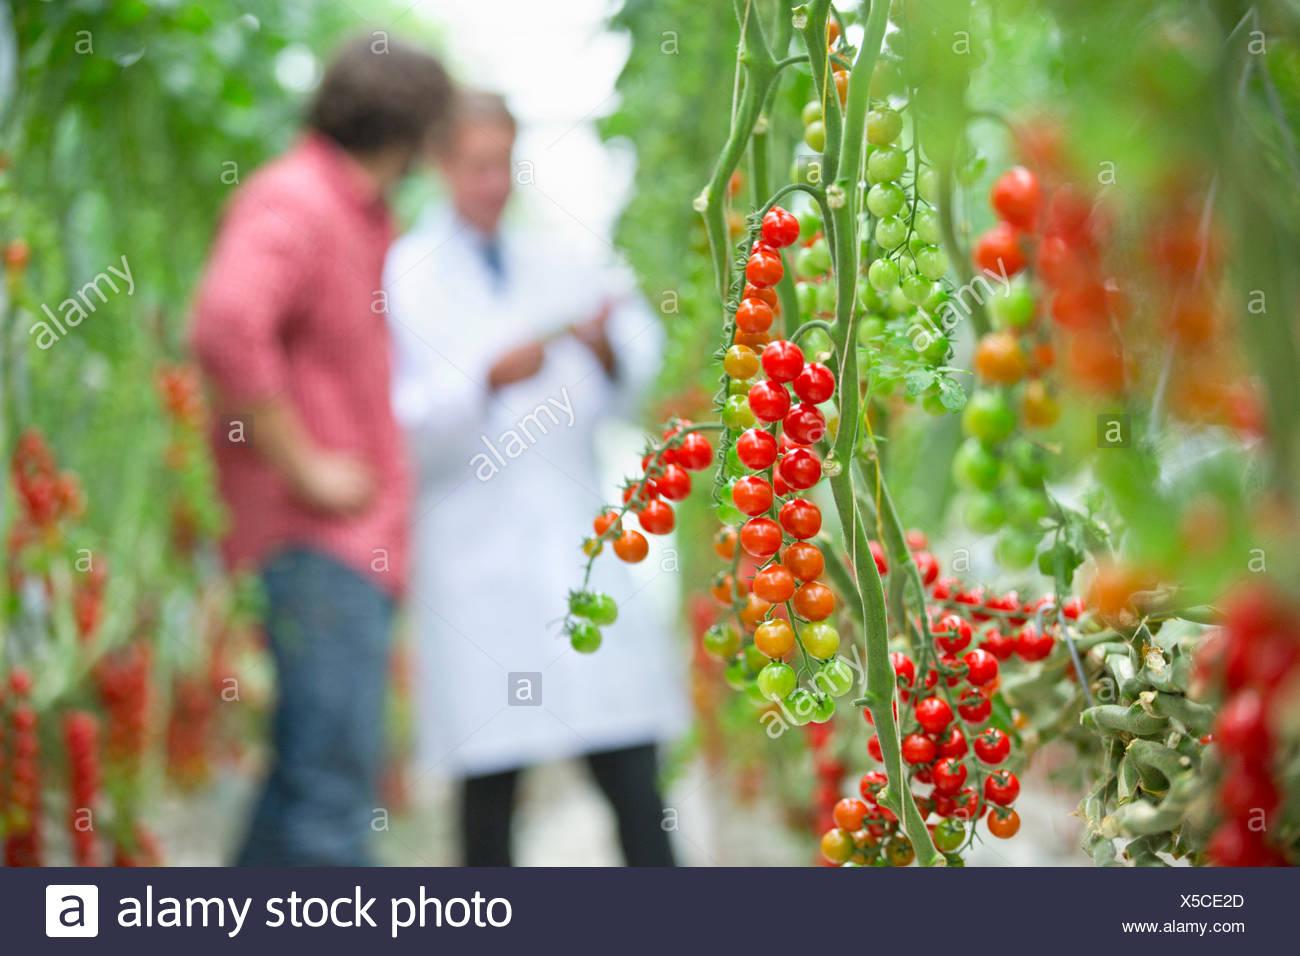 Tomaten Reifen an Rebstöcken Stockbild